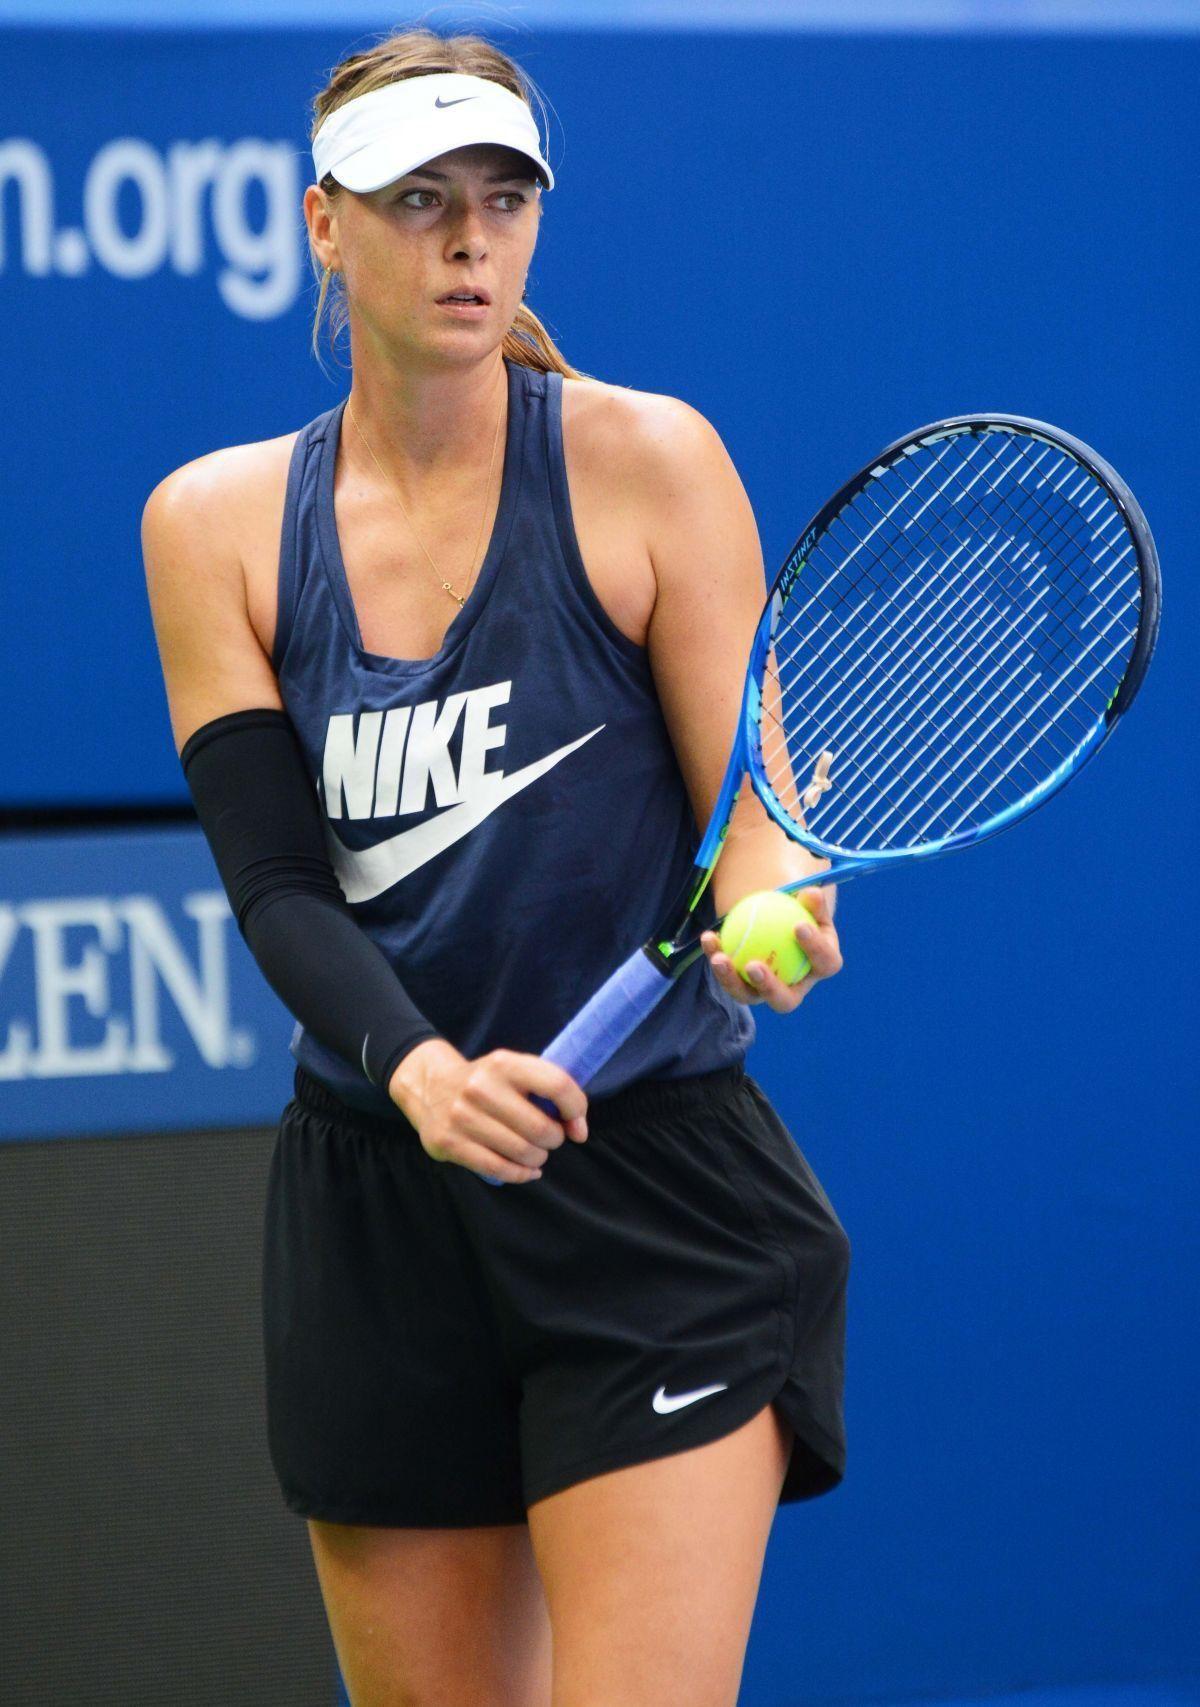 Maria Sharapova Maria sharapova, Tennis players female